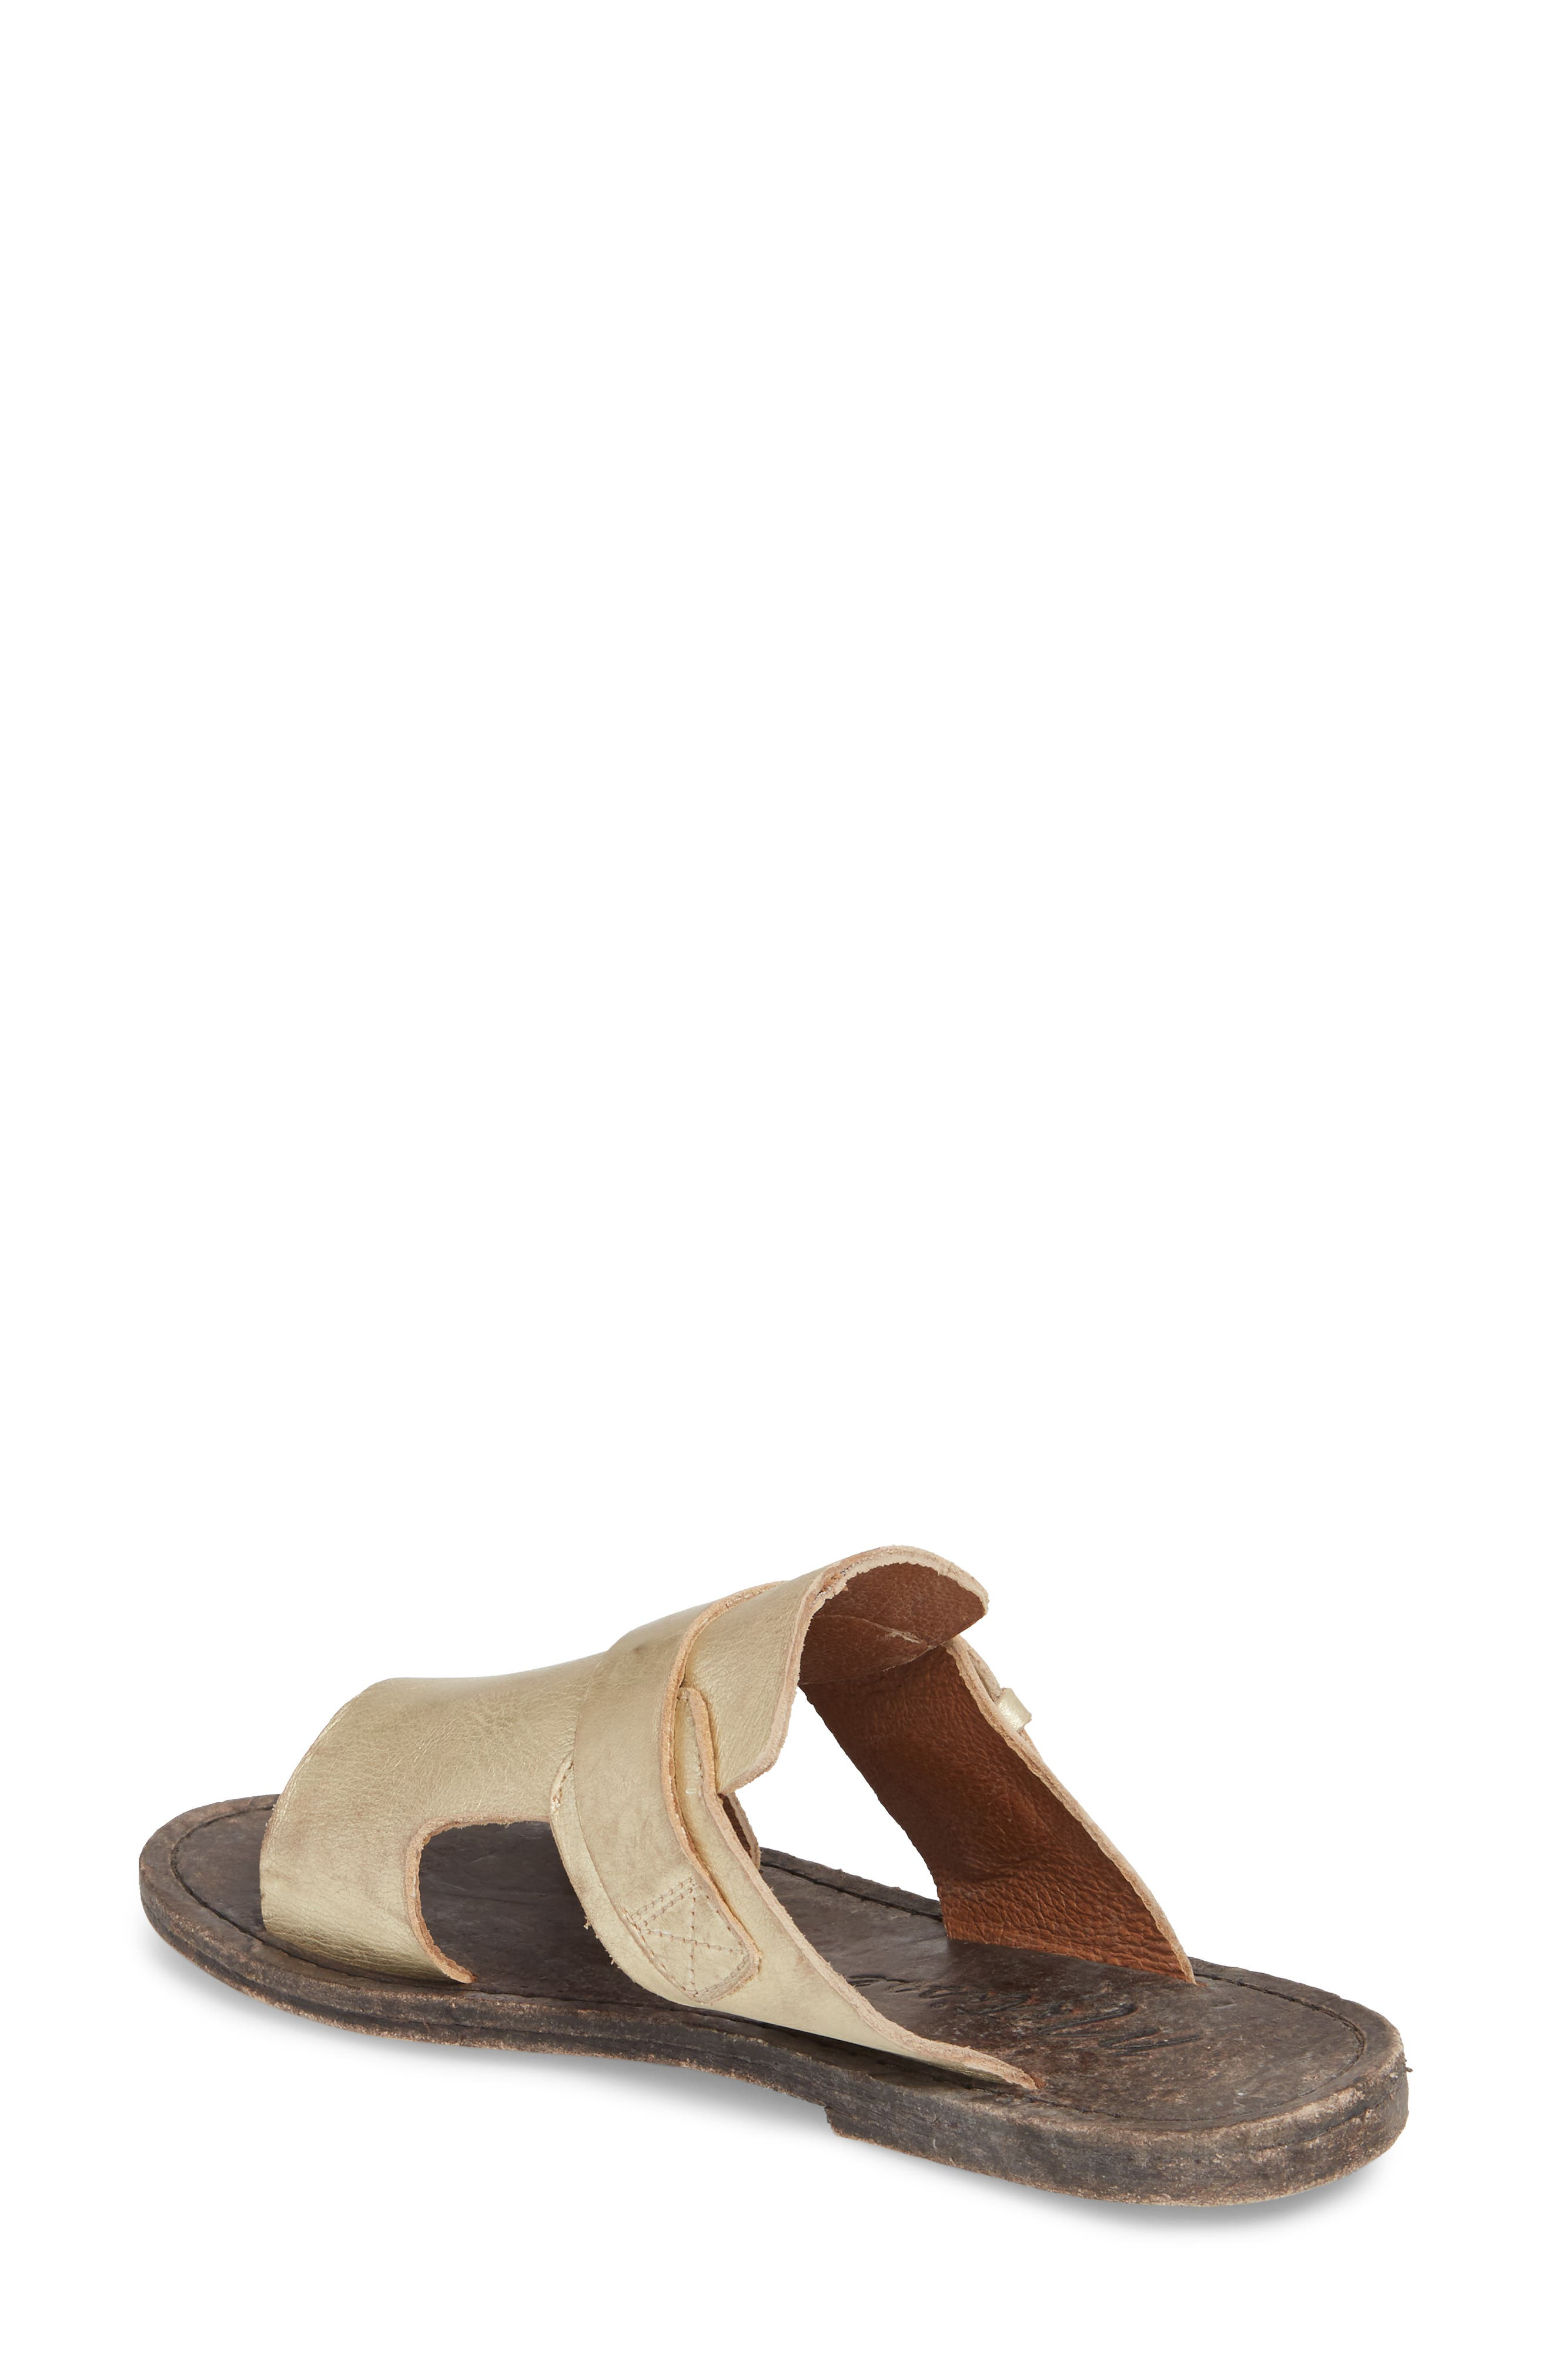 Abbie Slide Sandal,                             Alternate thumbnail 2, color,                             Gold Leather